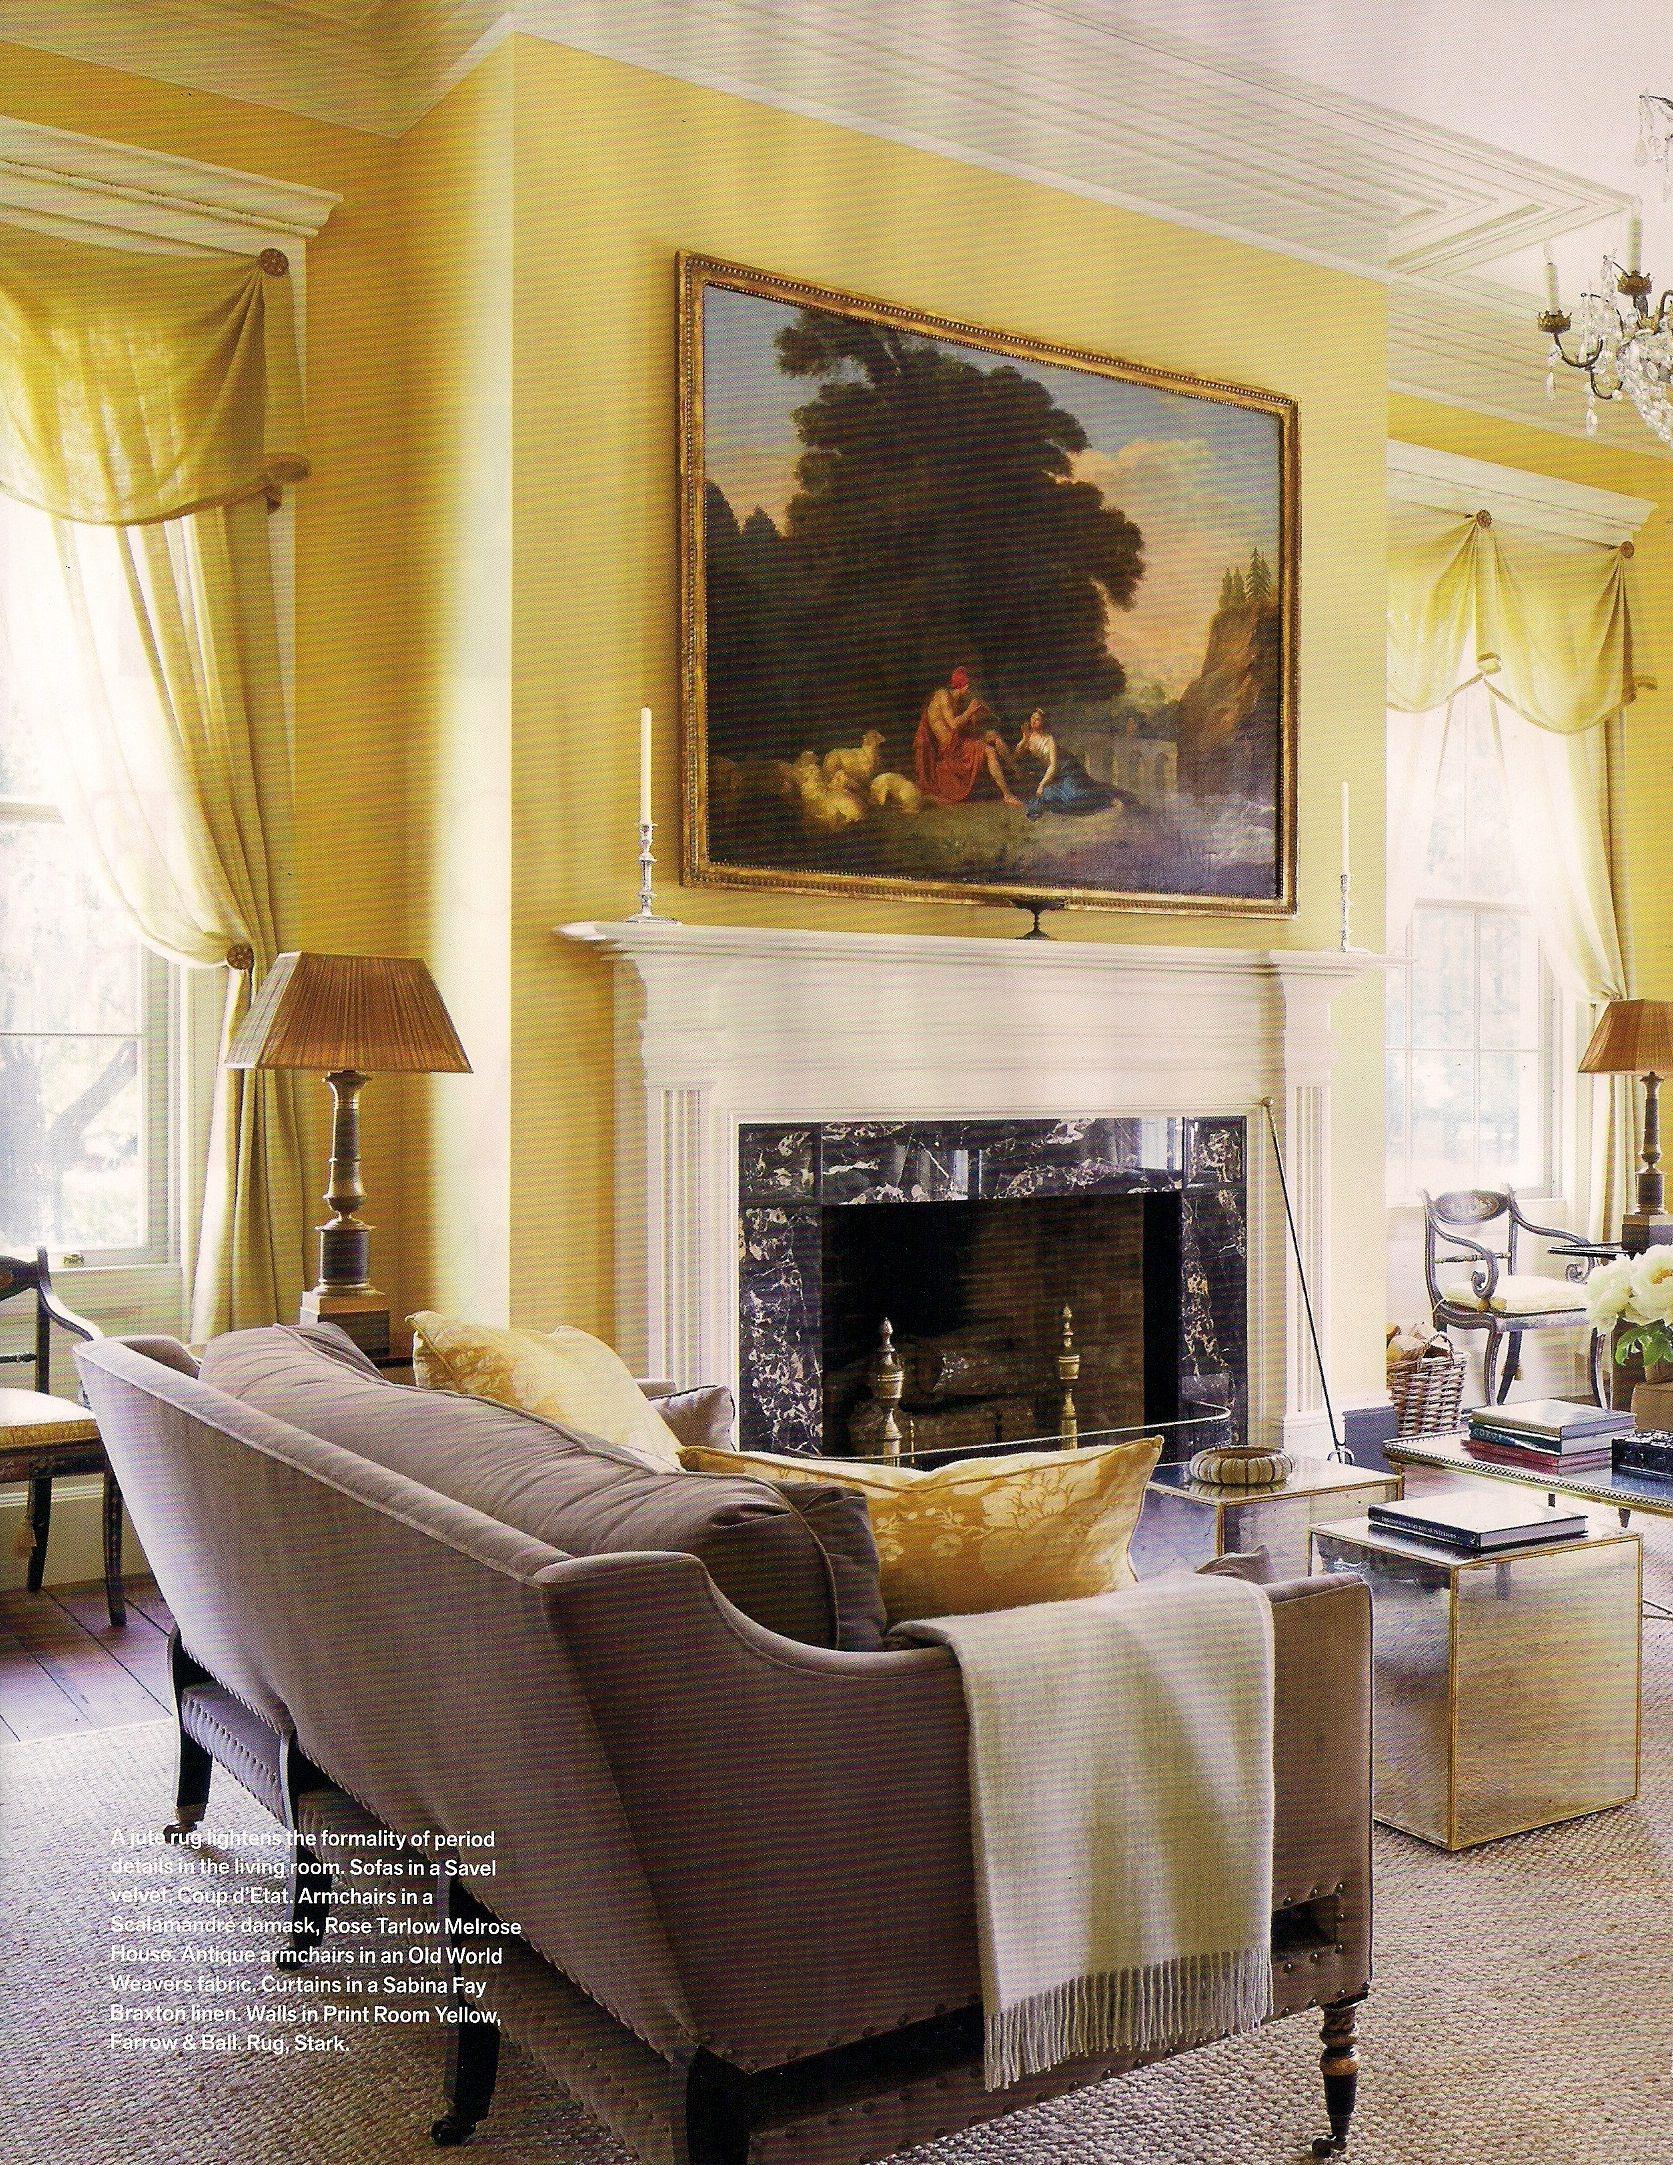 Interior designers in charleston sc - Interior Design Amelia T Handegan South Carolina Greek Revival Country Home Birdsong